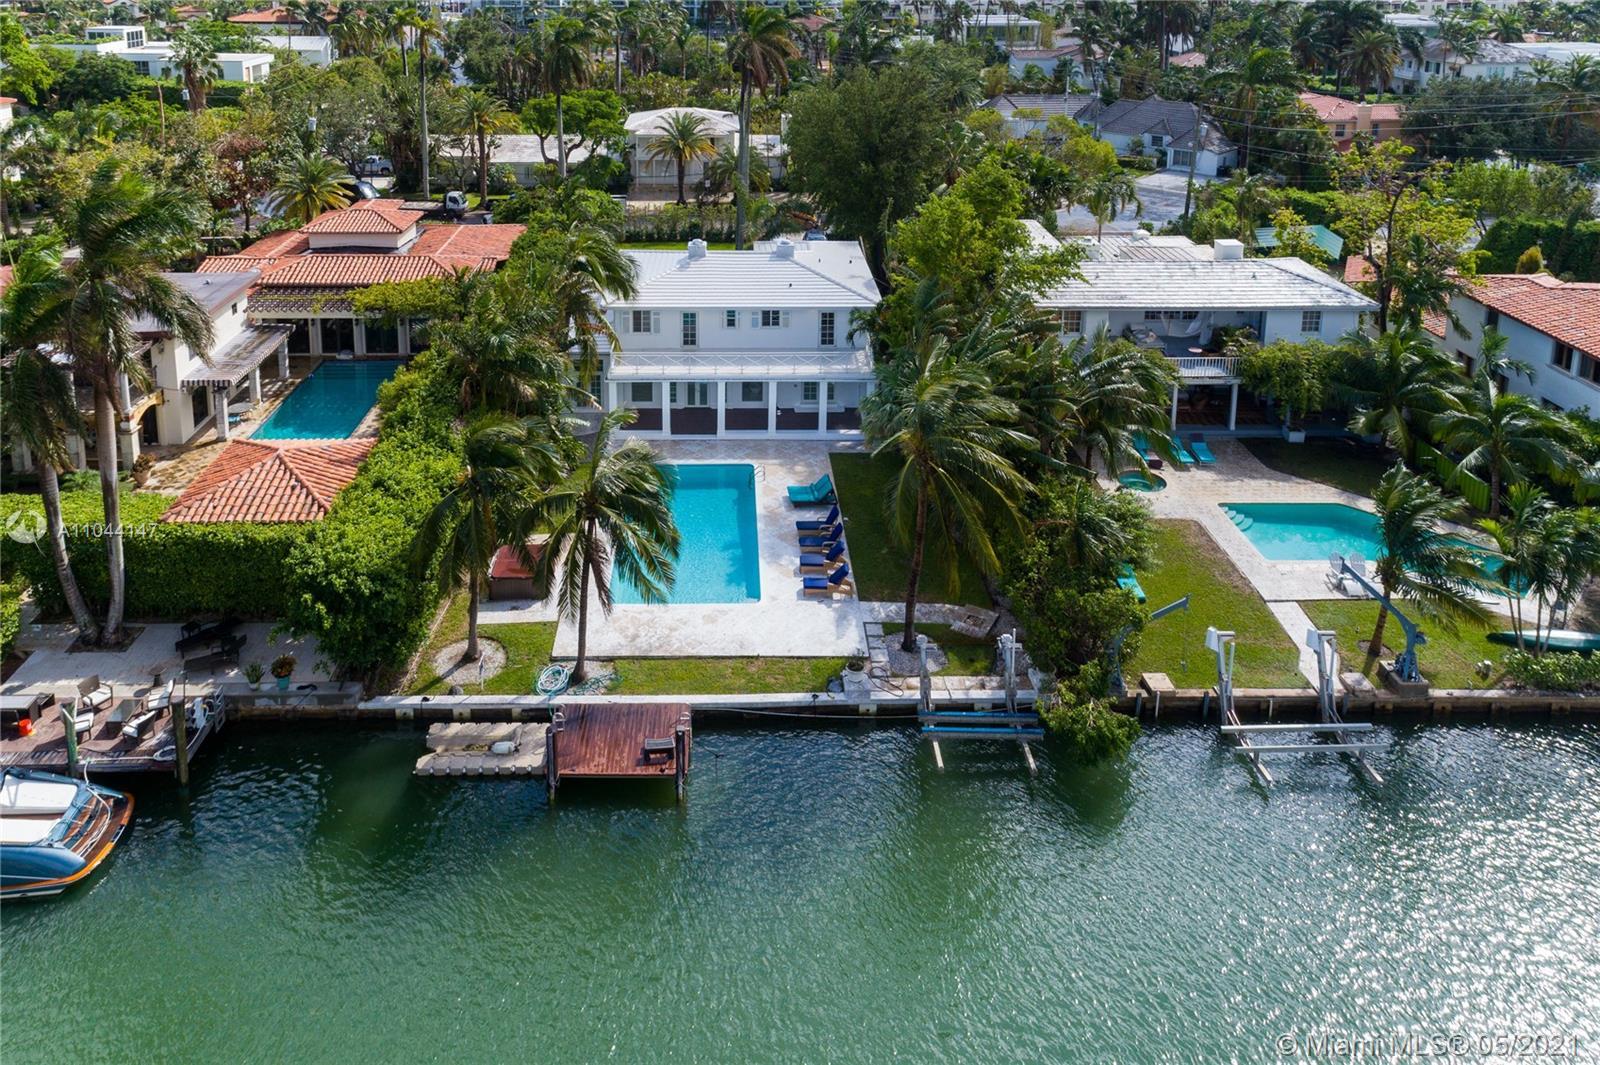 Sunset Islands - 1431 W 22 ST, Miami Beach, FL 33140